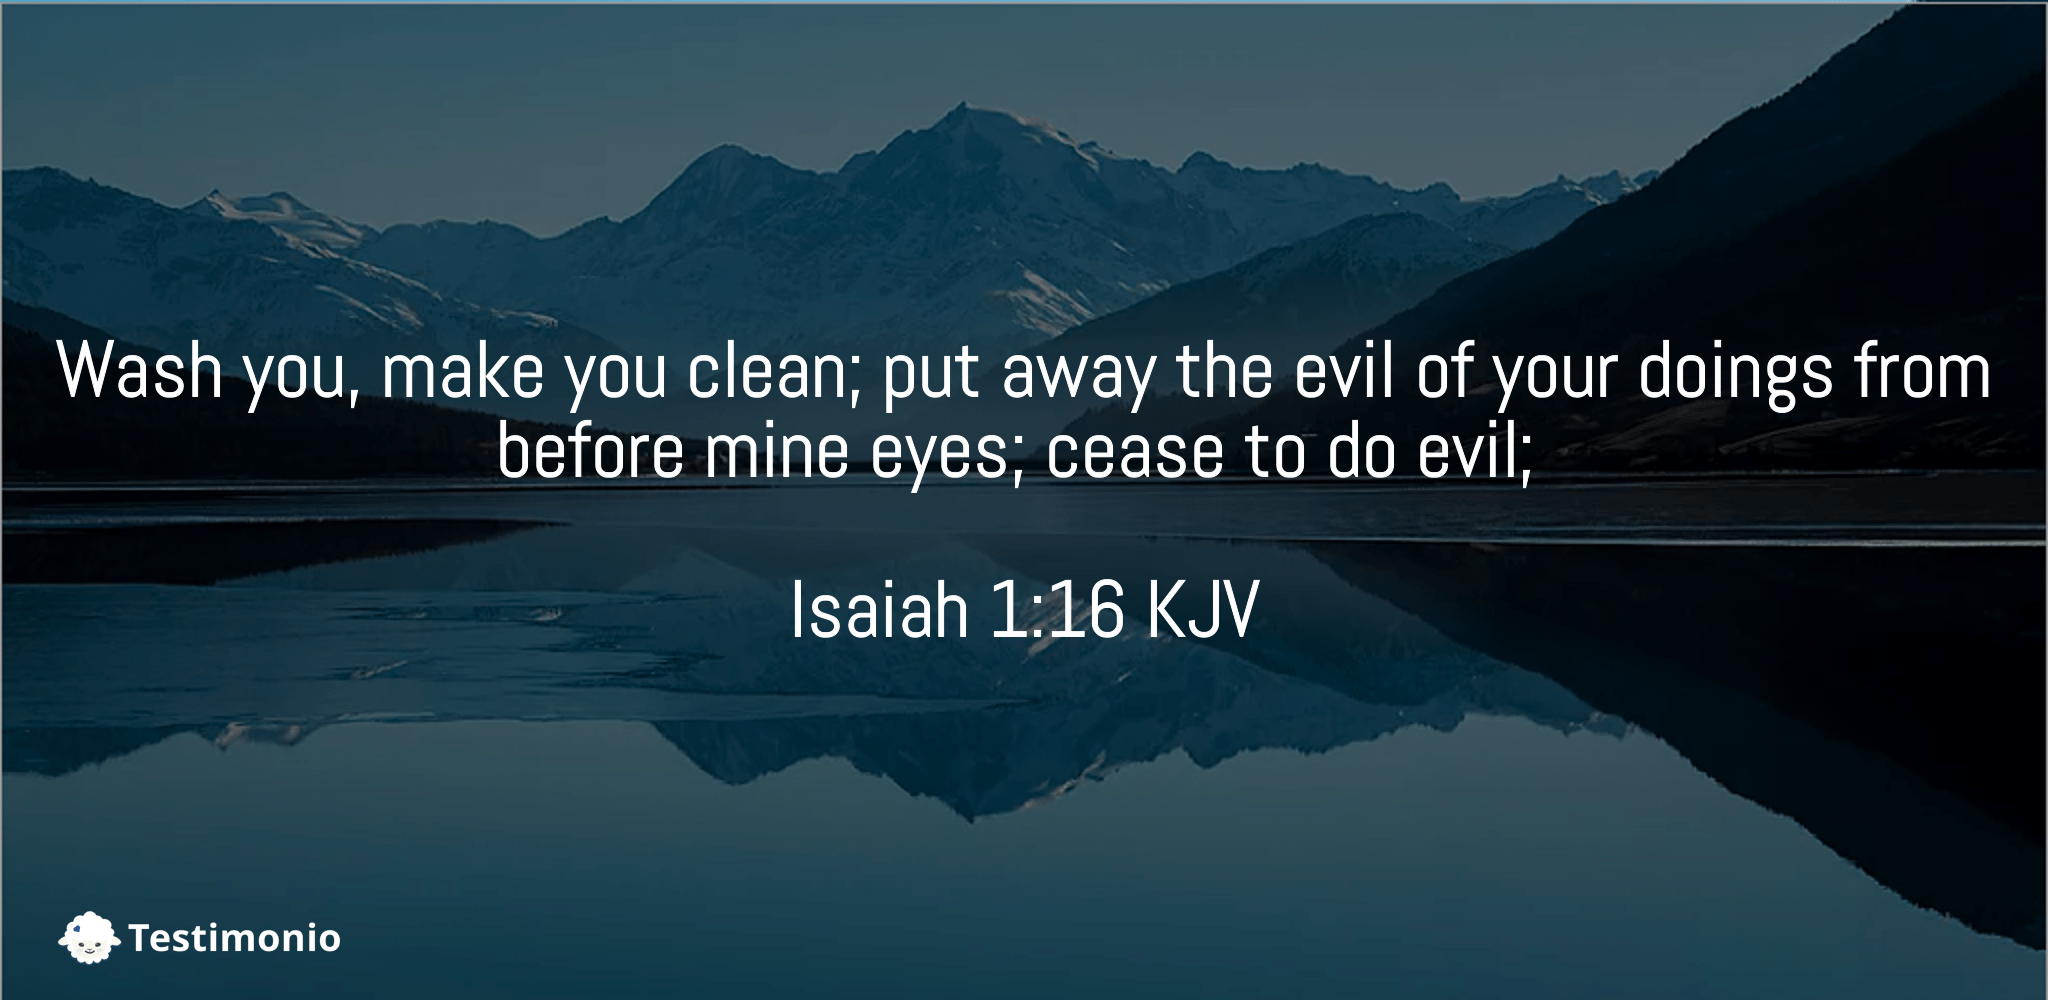 Isaiah 1:16